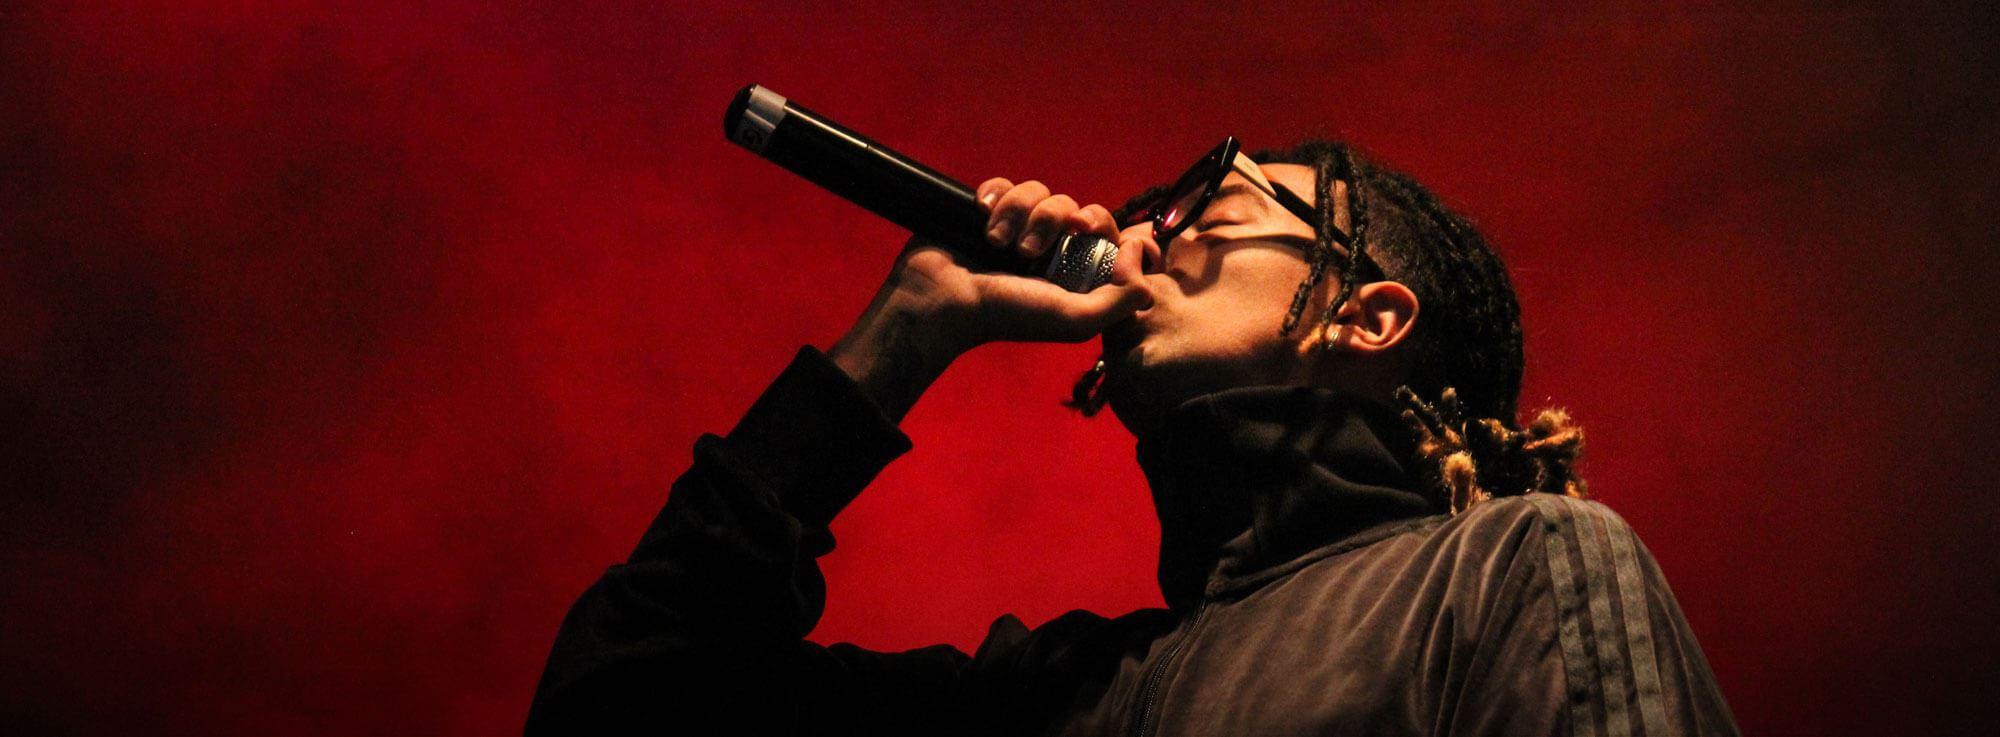 Stornara: Stornara Festival Rap